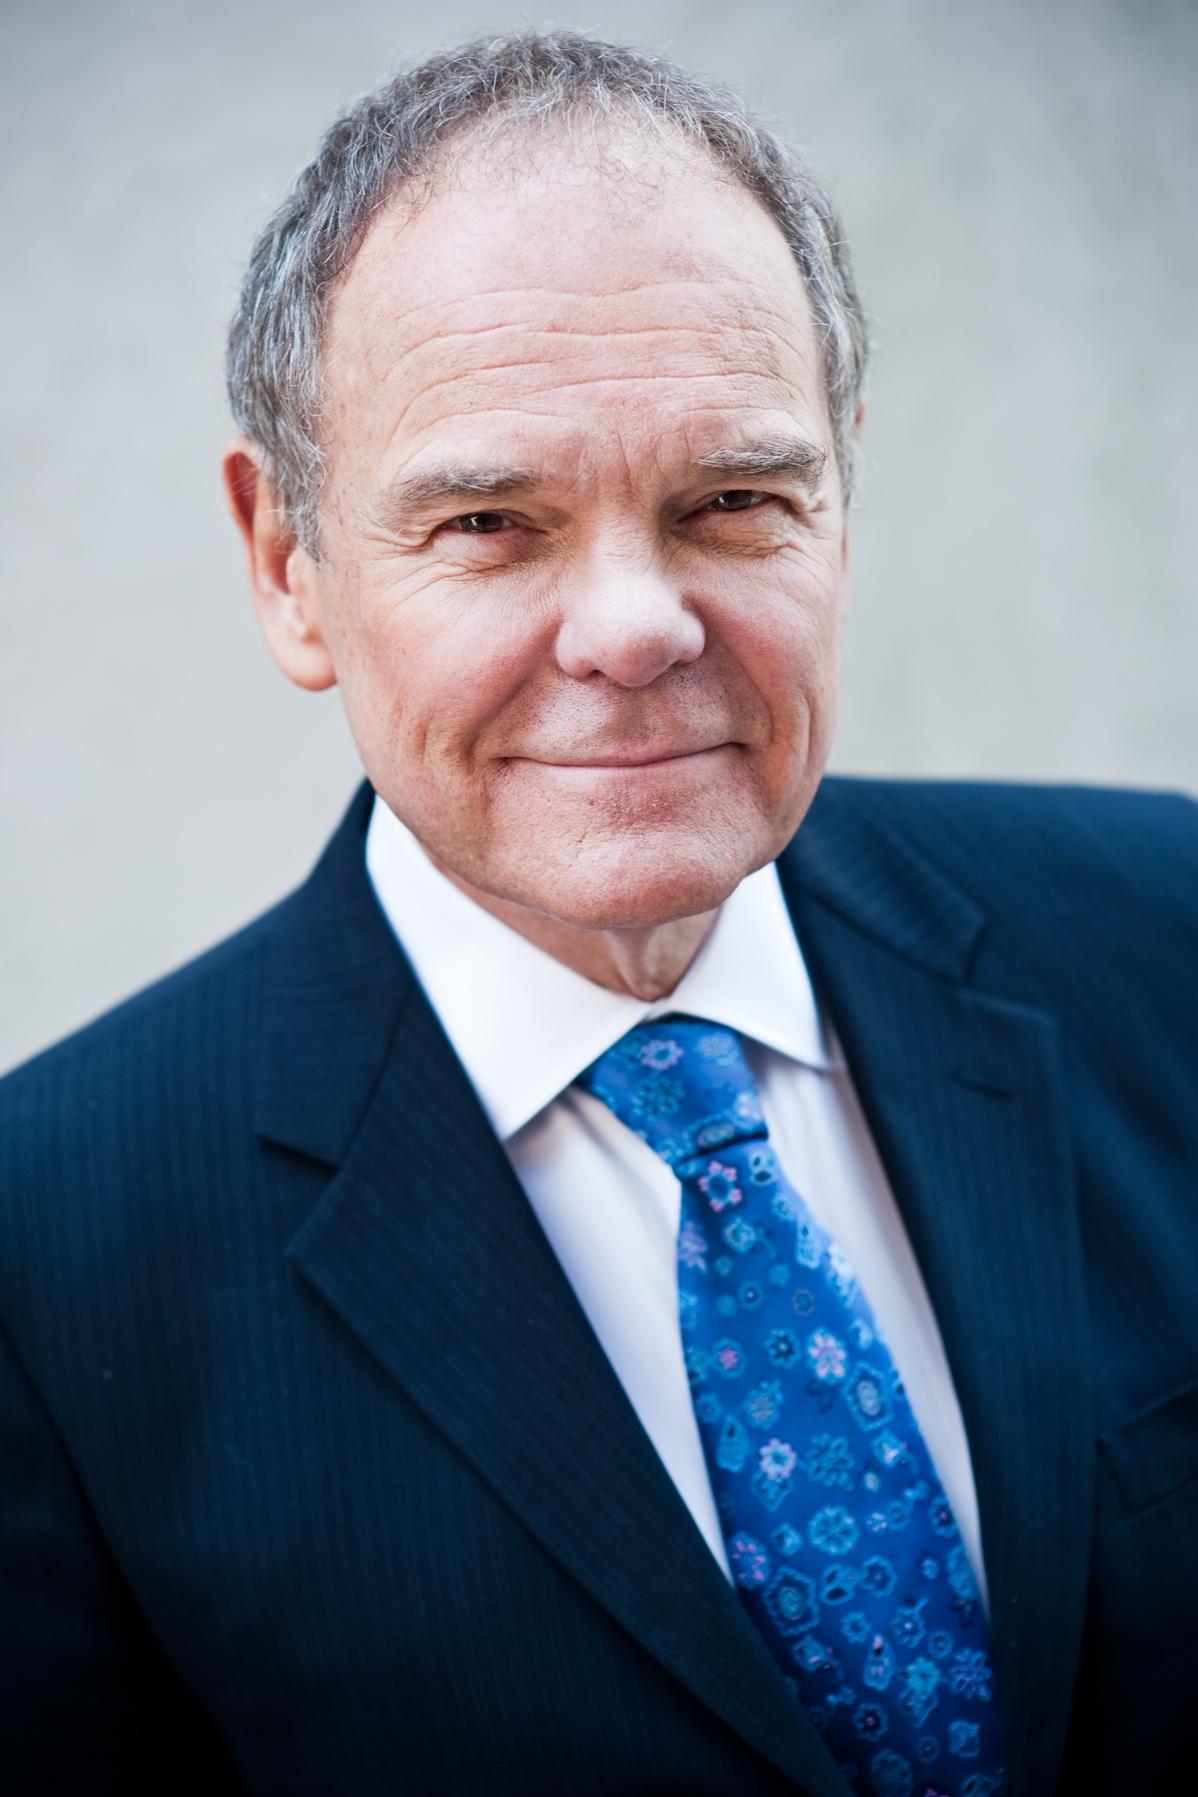 Don Tapscott - CEO Tapscott GroupLes mer